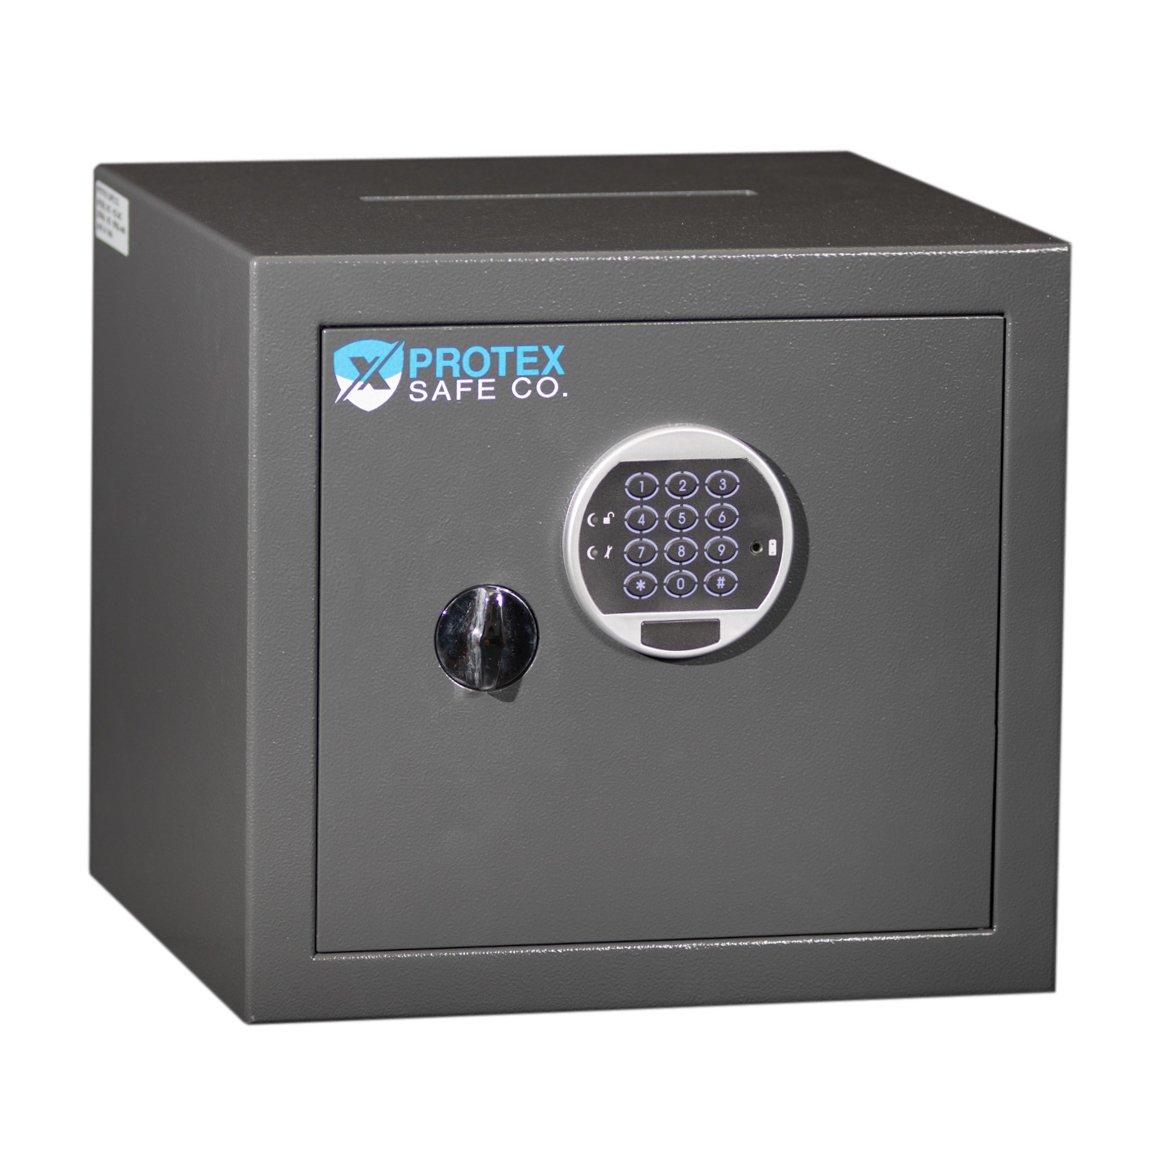 Protex Top Drop Burglary Safe (HD-34C)